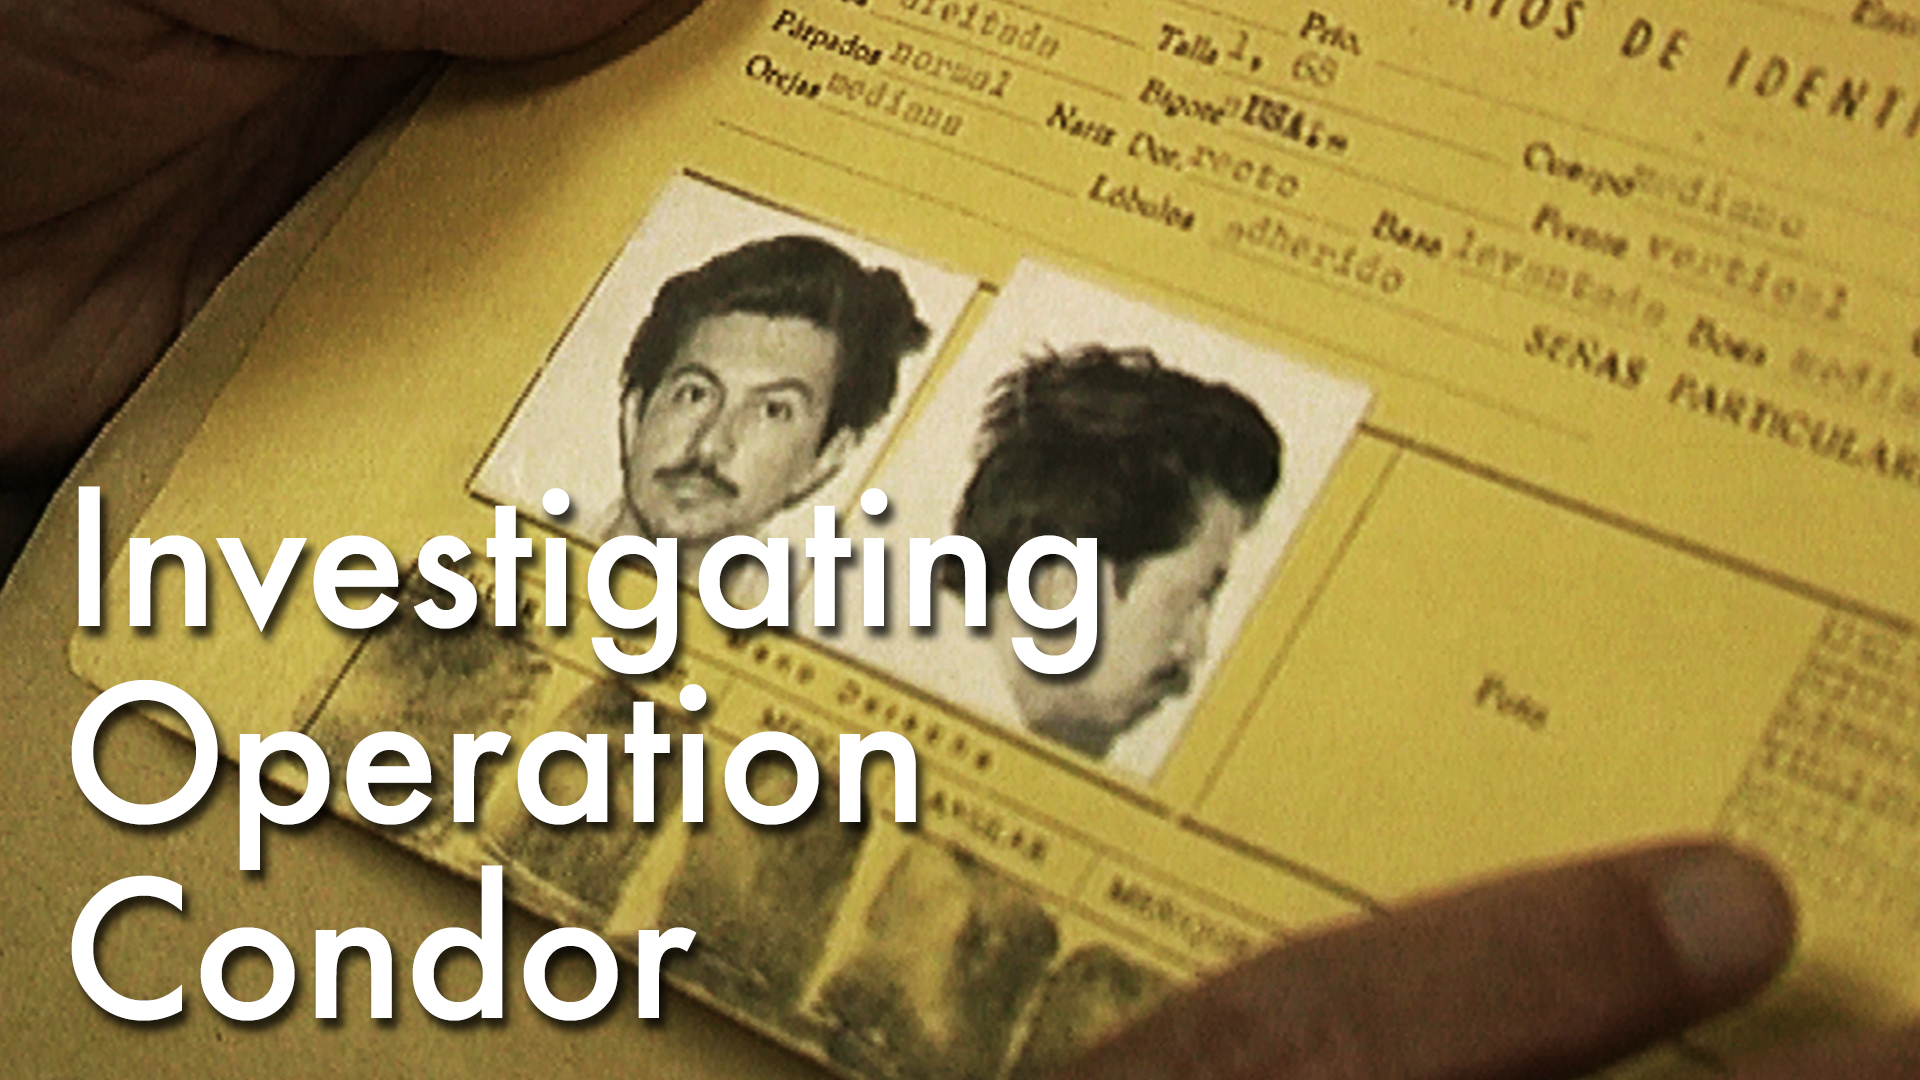 Investigating Operation Condor